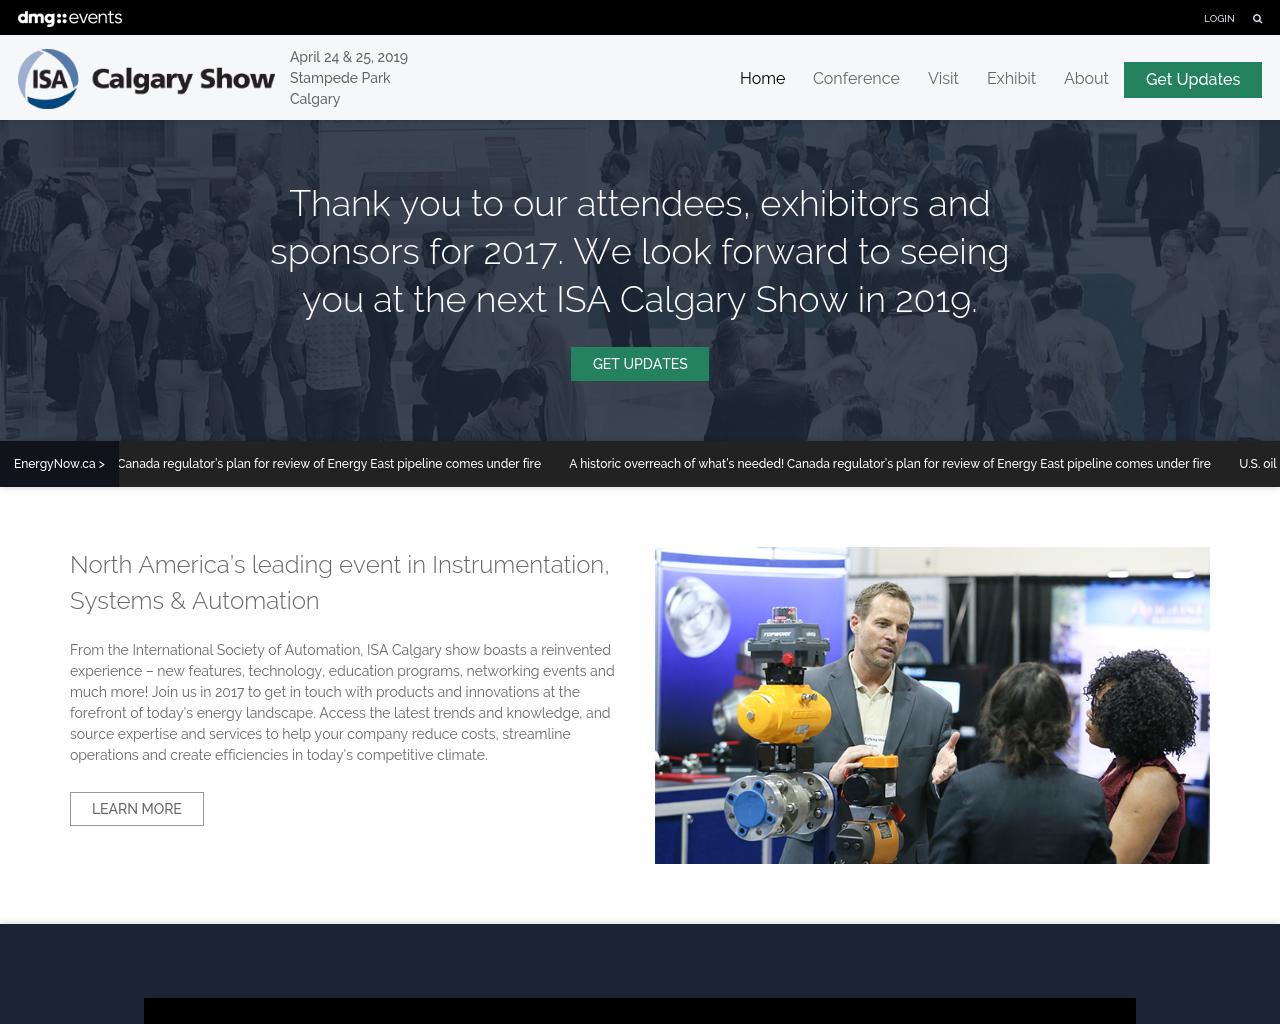 ISA-CALGARY-SHOW-Advertising-Reviews-Pricing